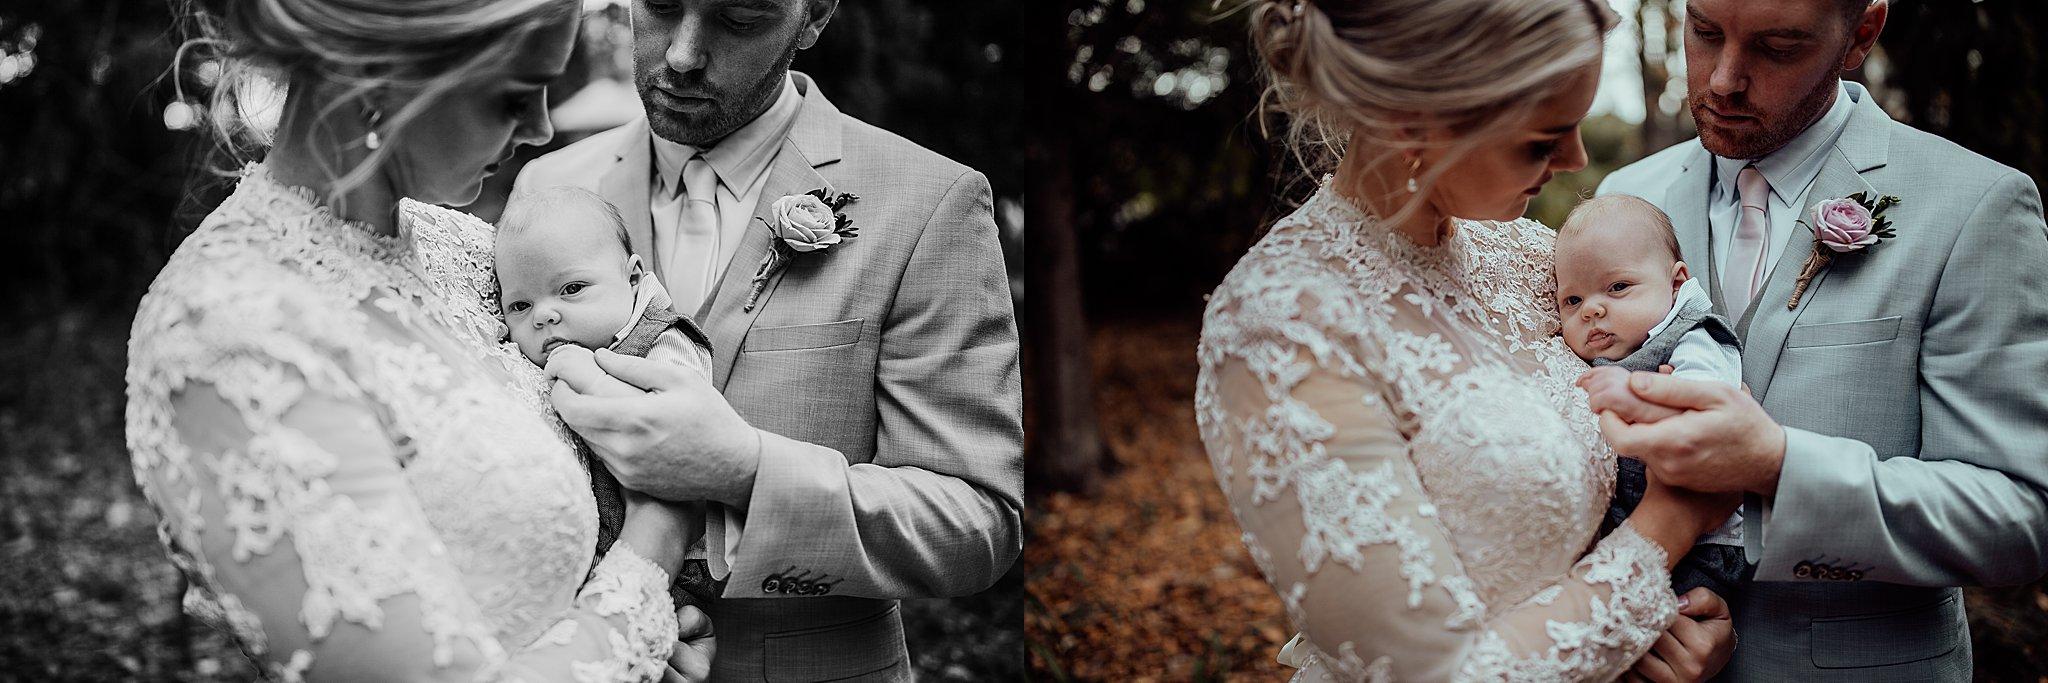 mickalathomas_puremacphotography_weddingphotographer_couplephotographer_Sheppartonphotographer_3404.jpg